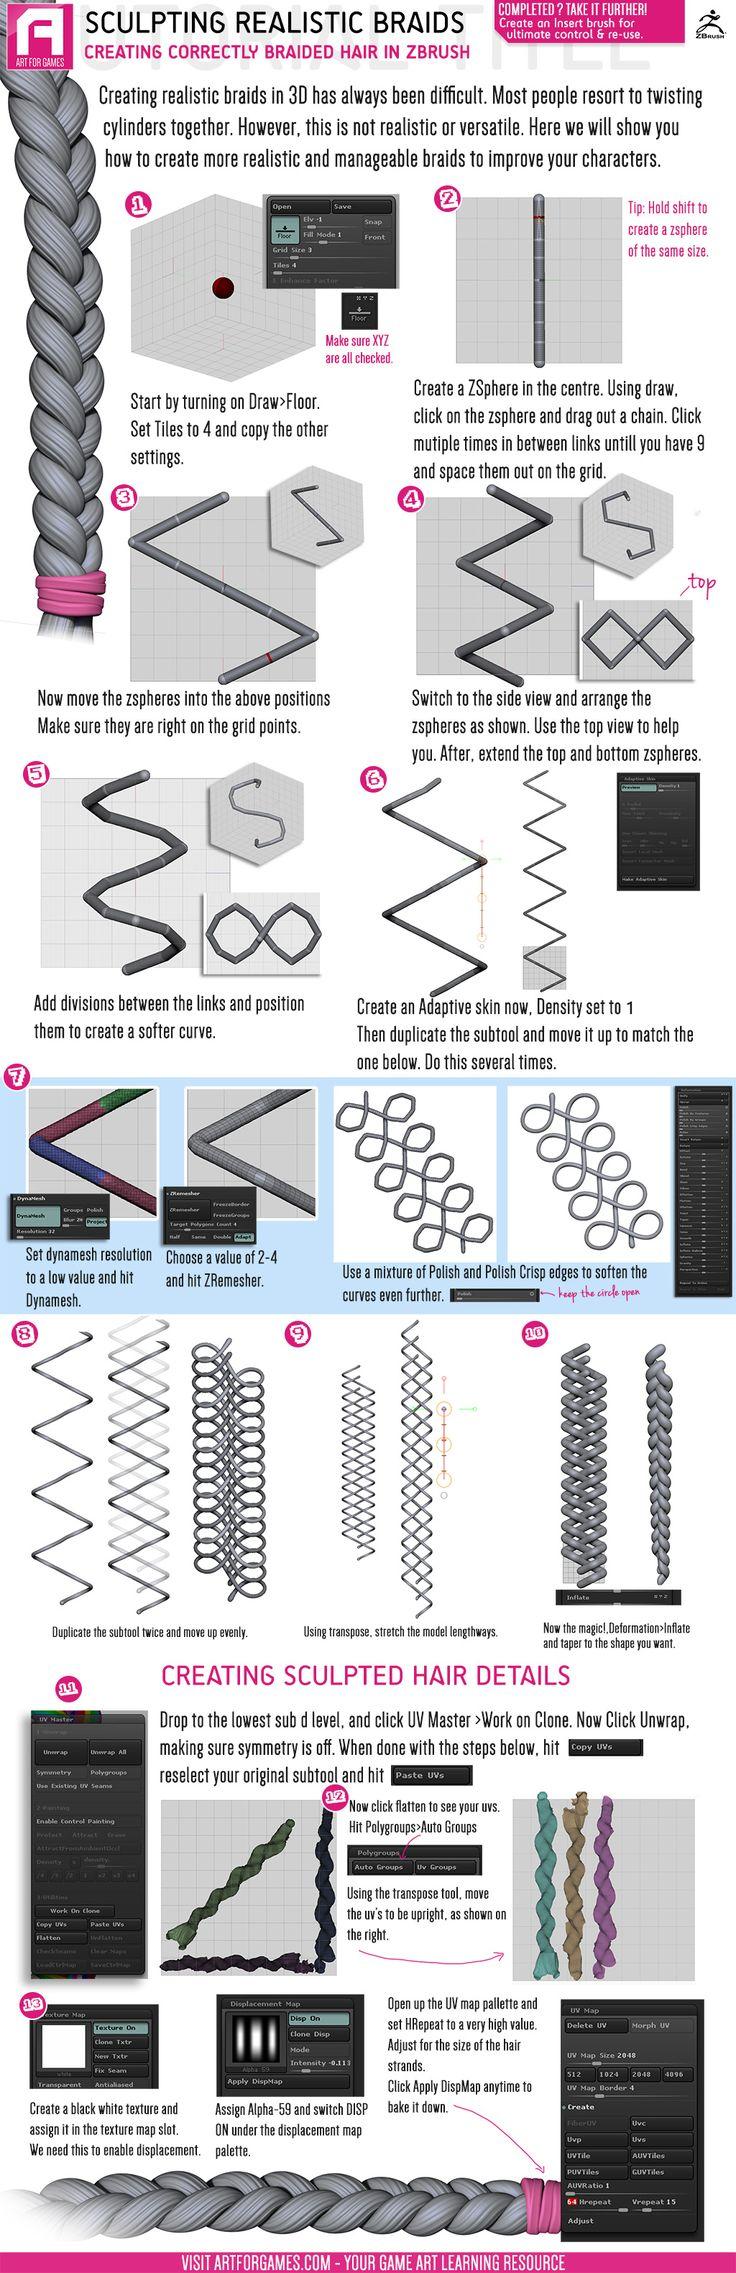 http://artforgames.com/infotuts/tutorial-braided-hair/